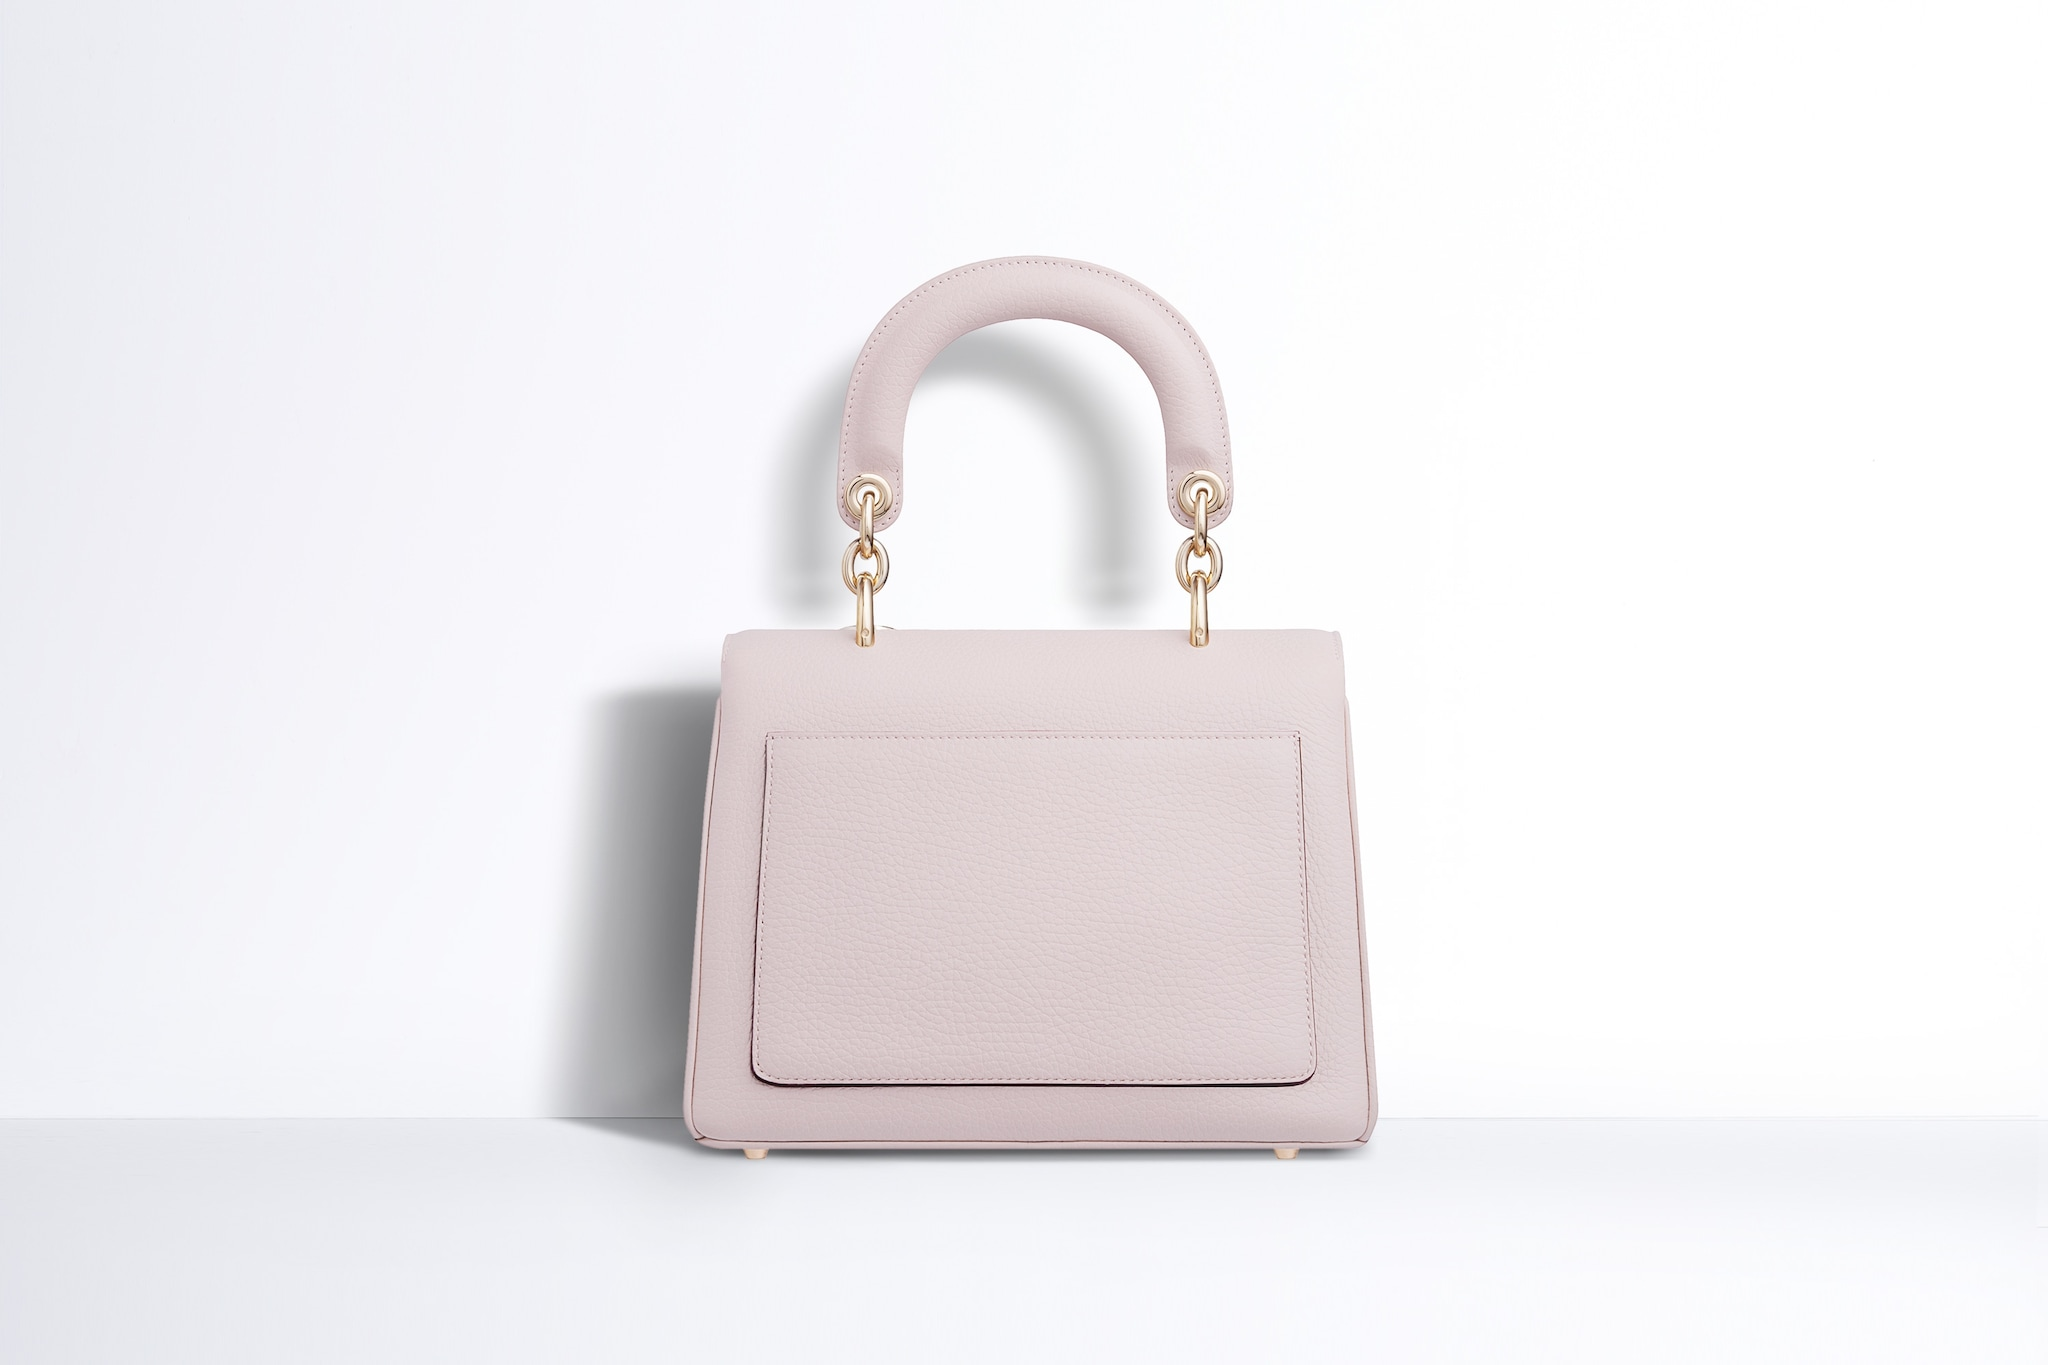 Buy Christian Dior Designer Bags in Portland, USA, Global shopping